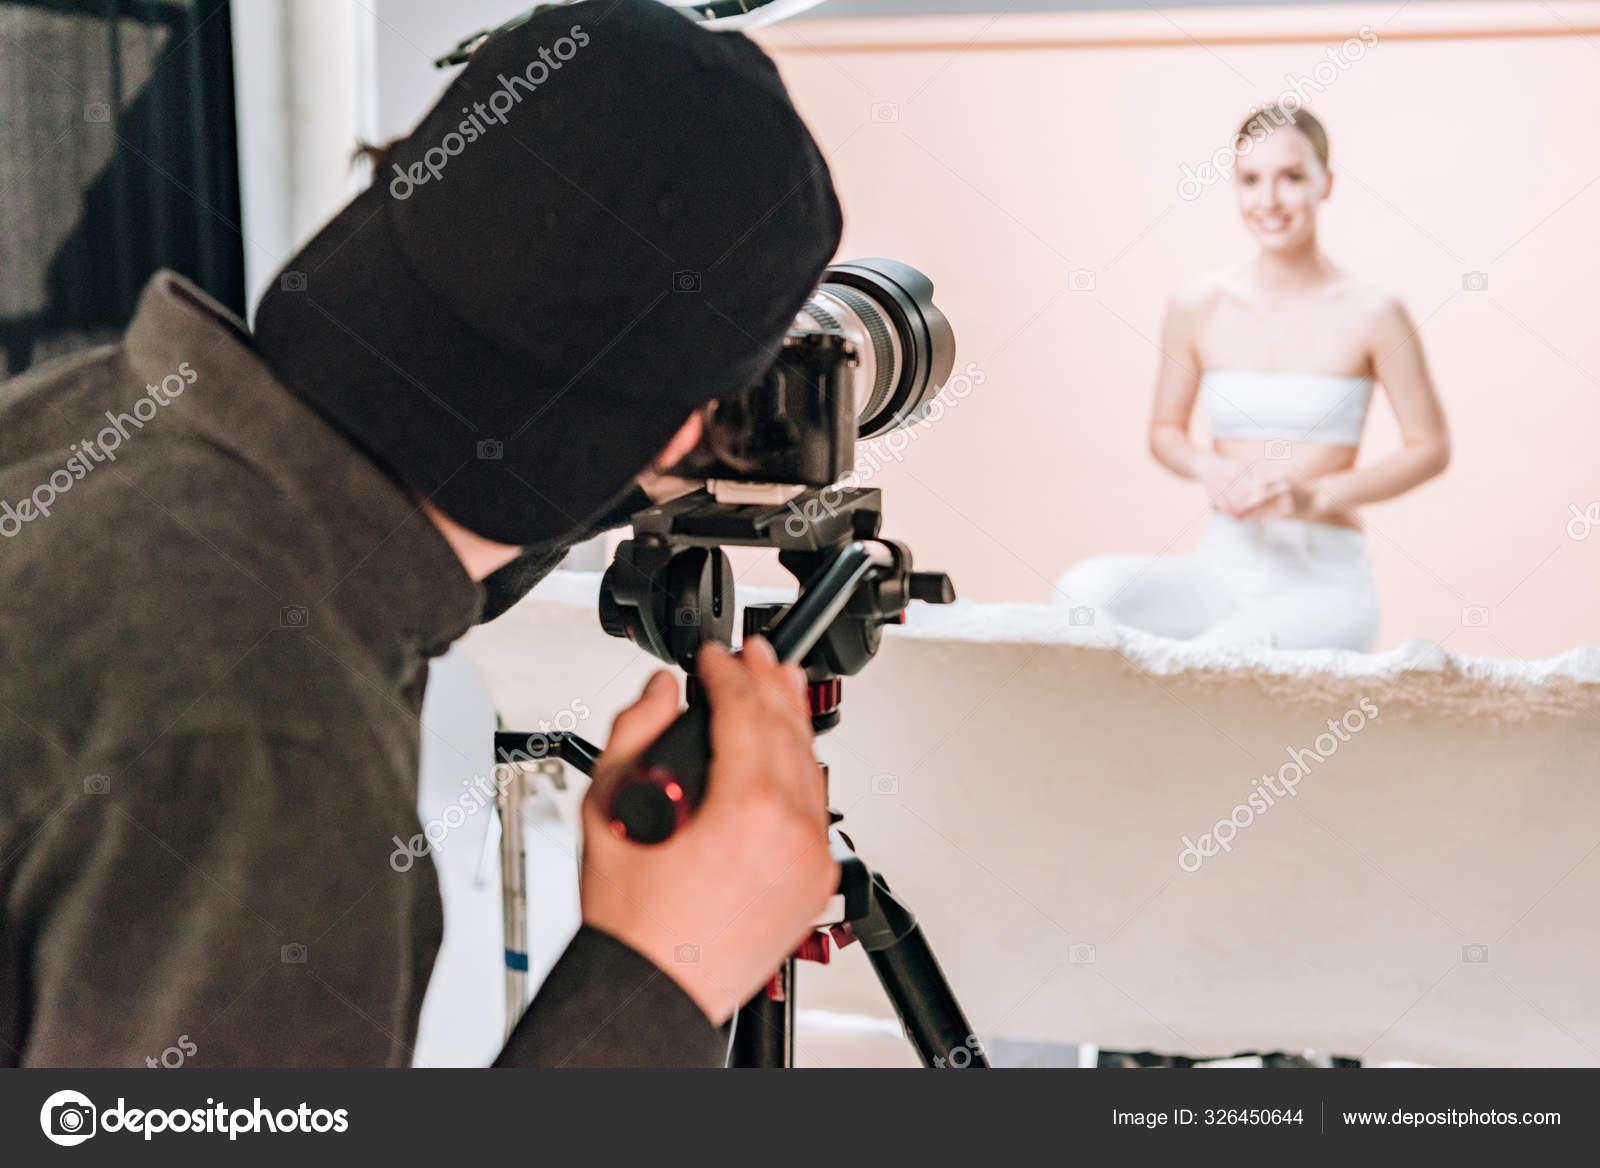 саратов работа оператор фотосалона плакатах графику, фотографию